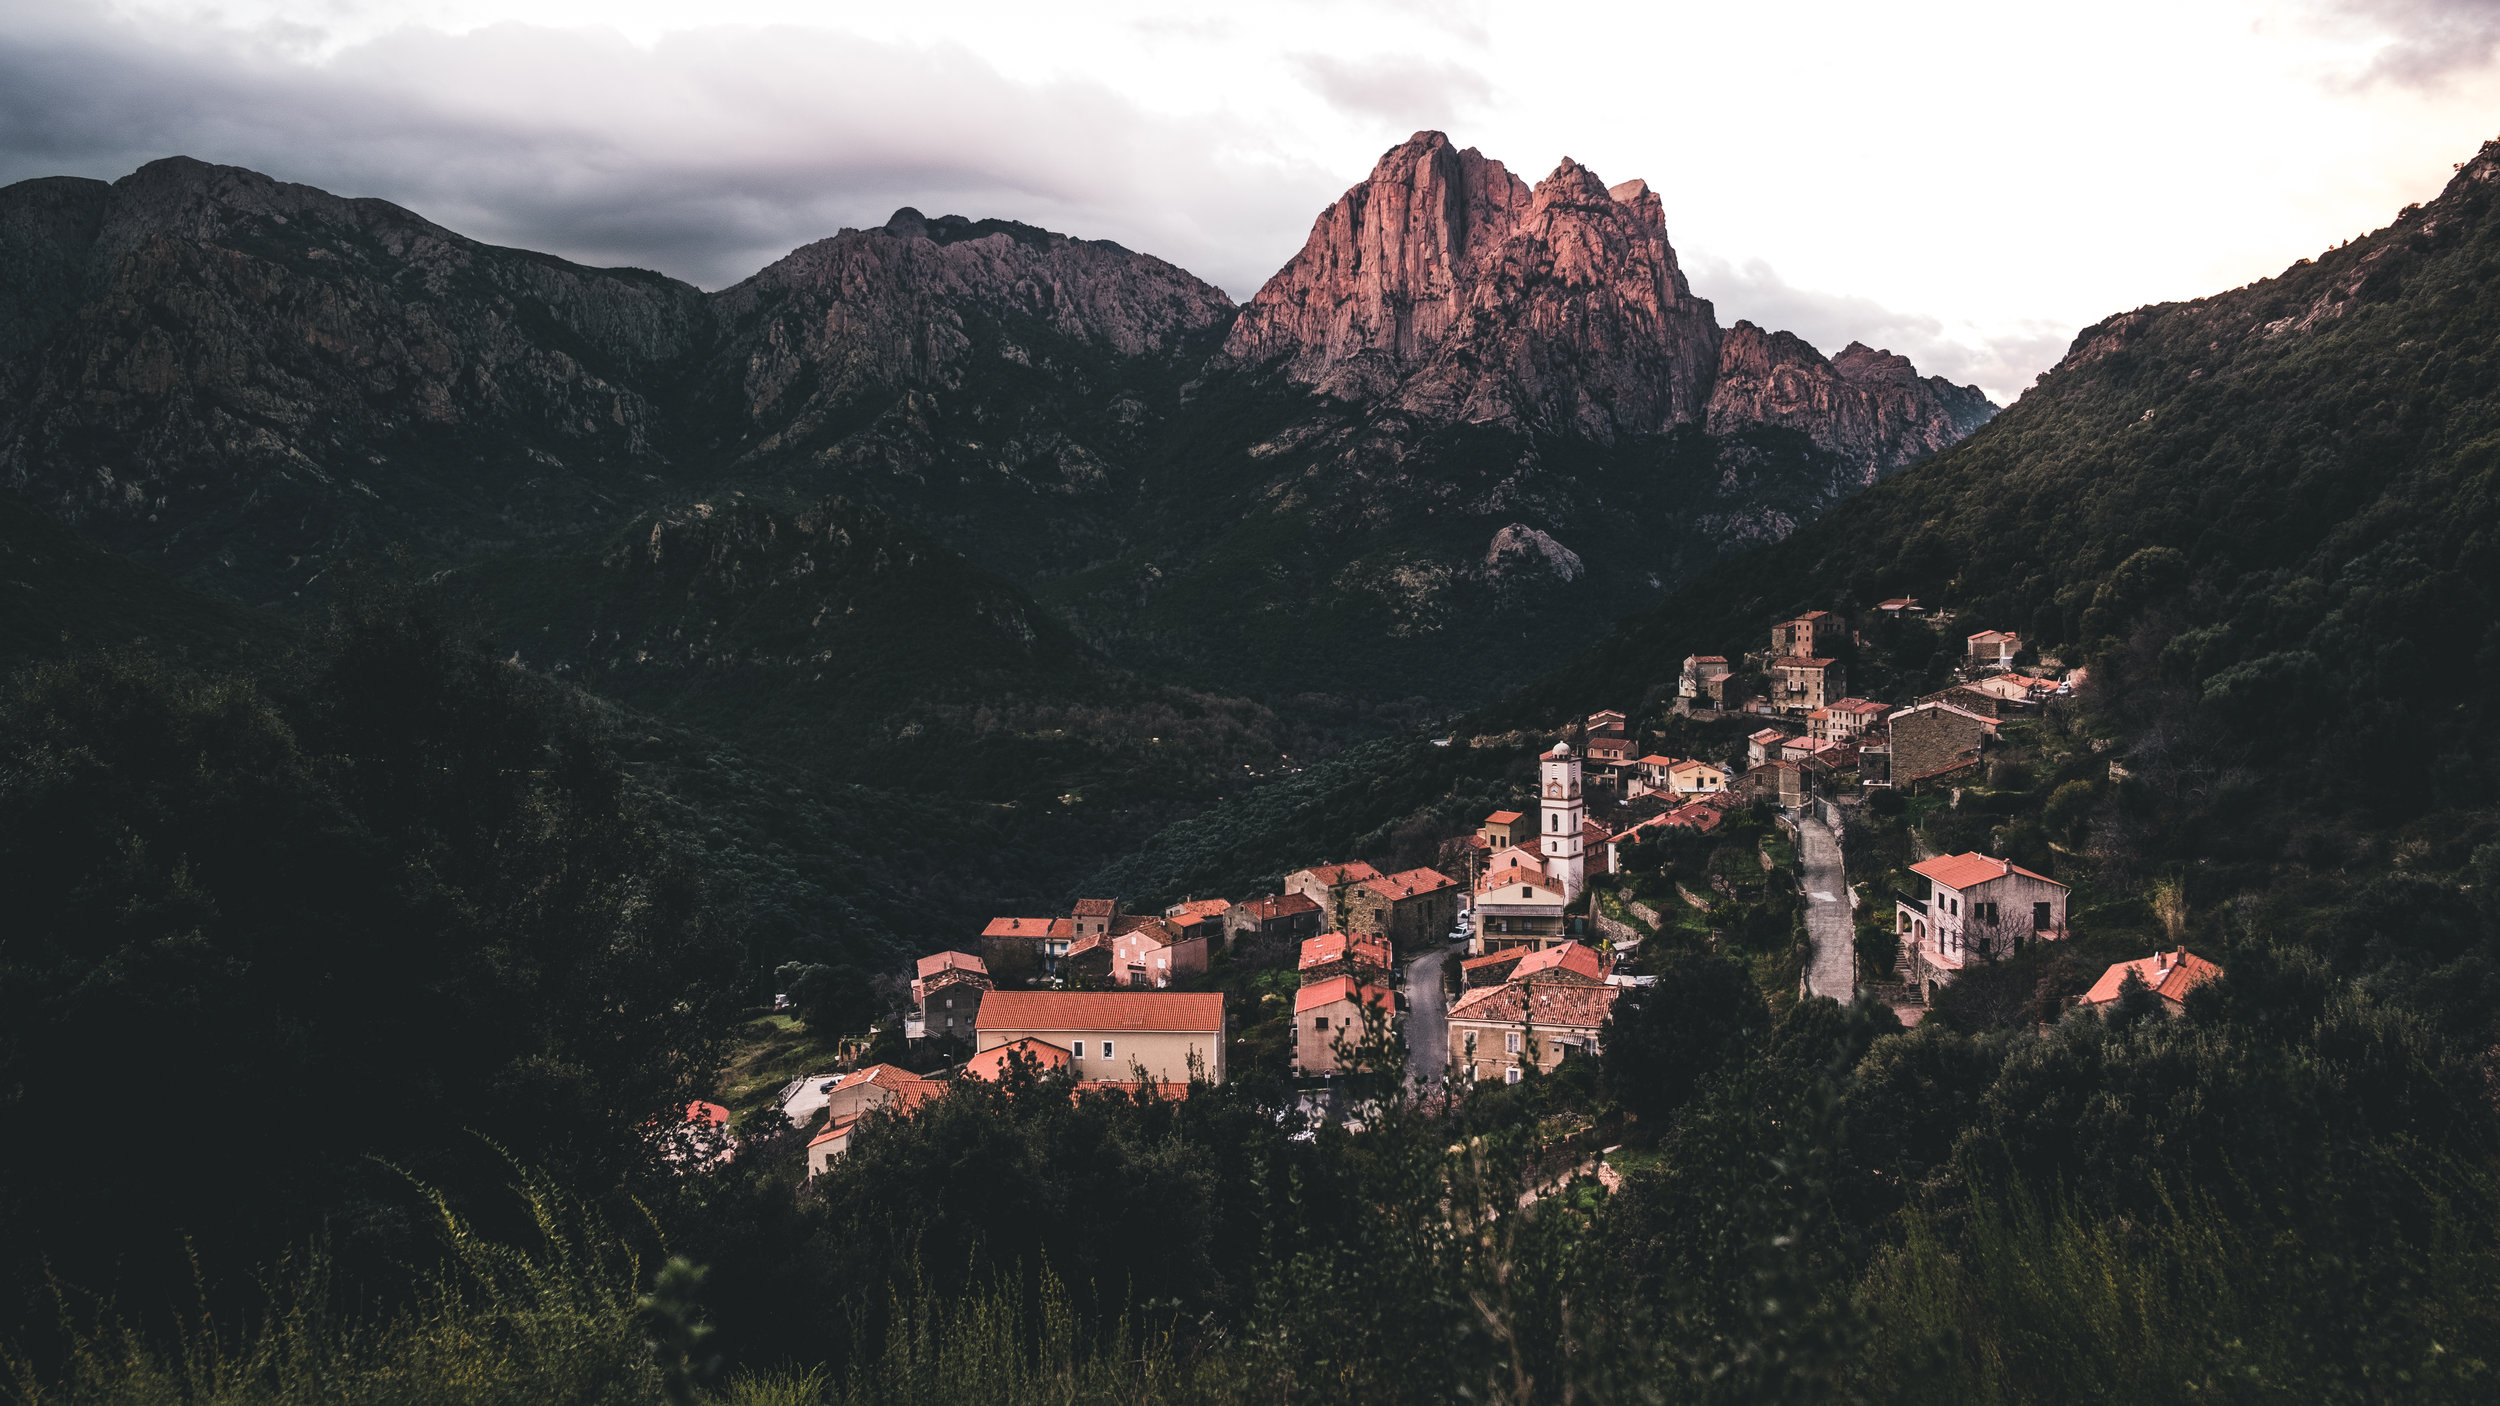 The beautiful village of Ota